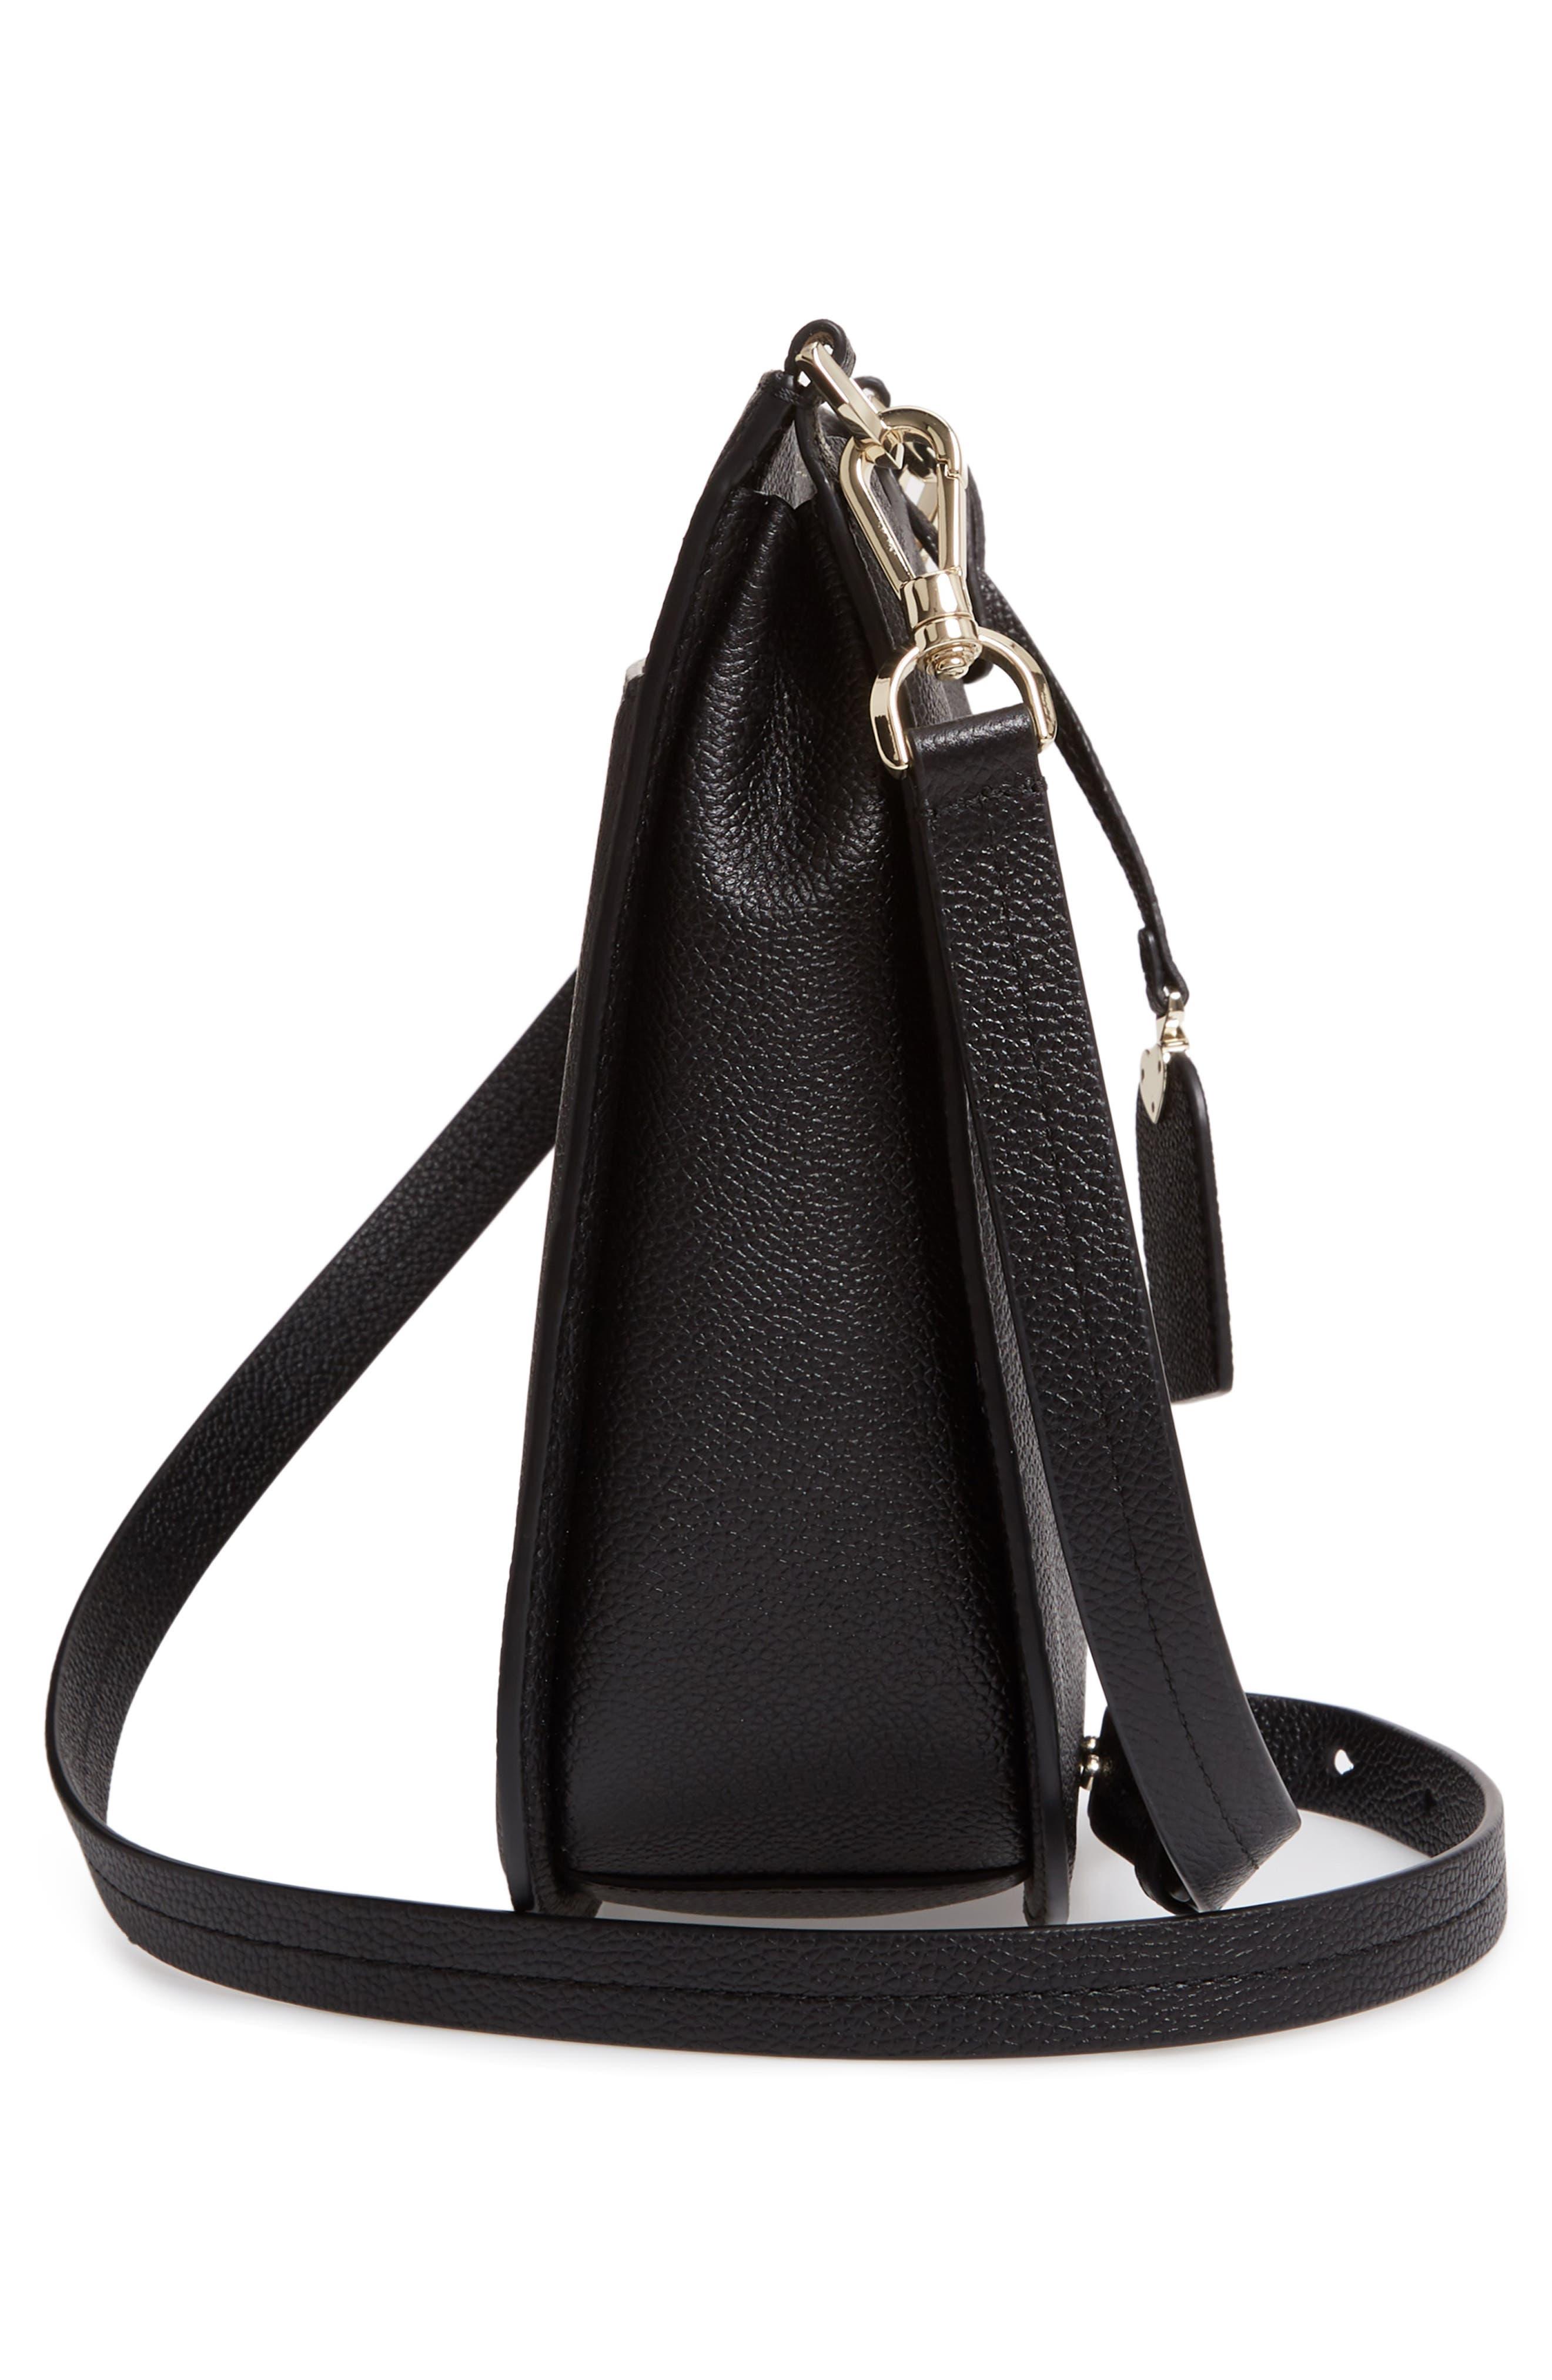 KATE SPADE NEW YORK,                             margaux large crossbody bag,                             Alternate thumbnail 5, color,                             BLACK